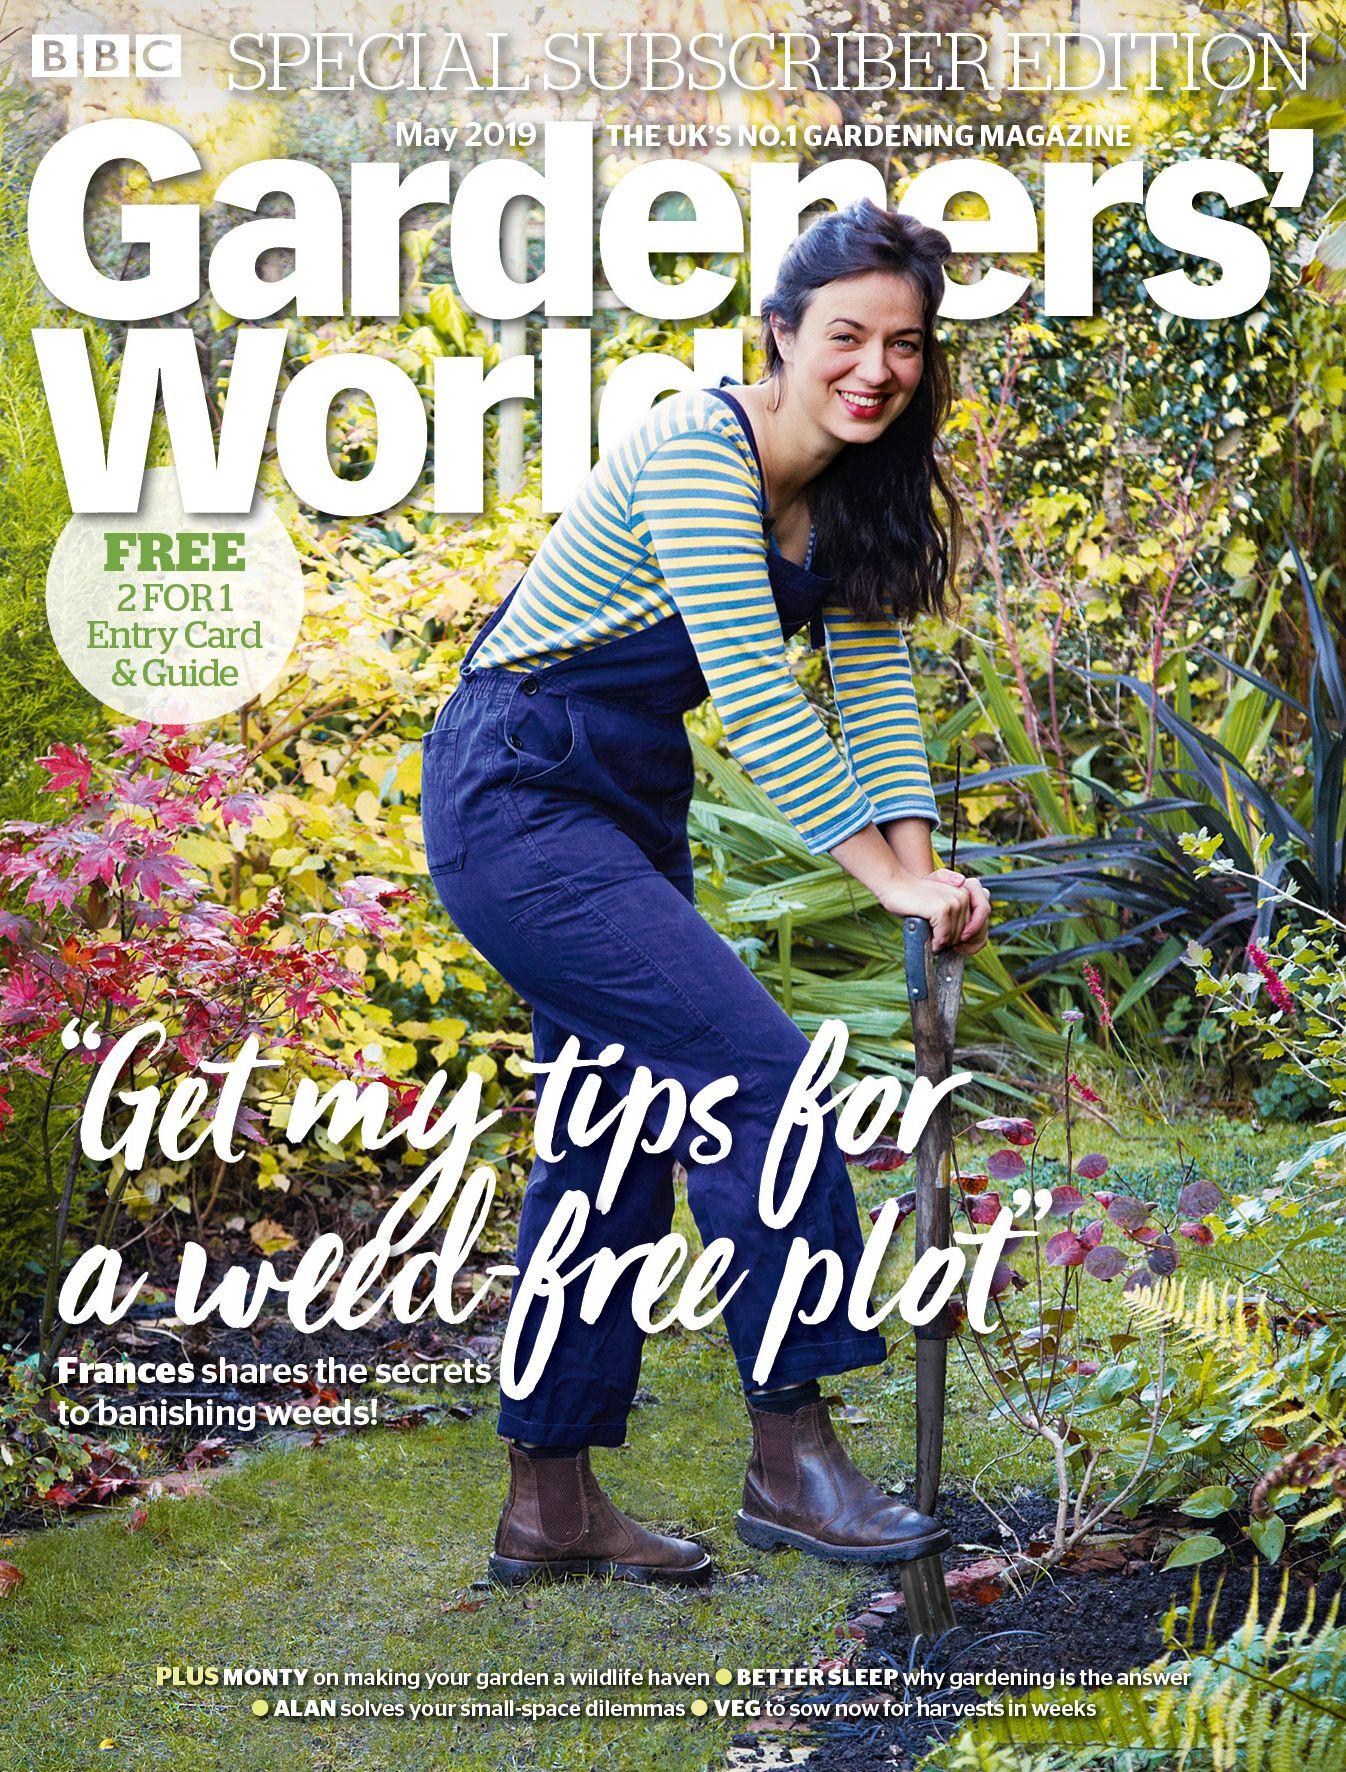 f1f064343b74904ecf120cd4716e913a - How To Be A Gardener Bbc